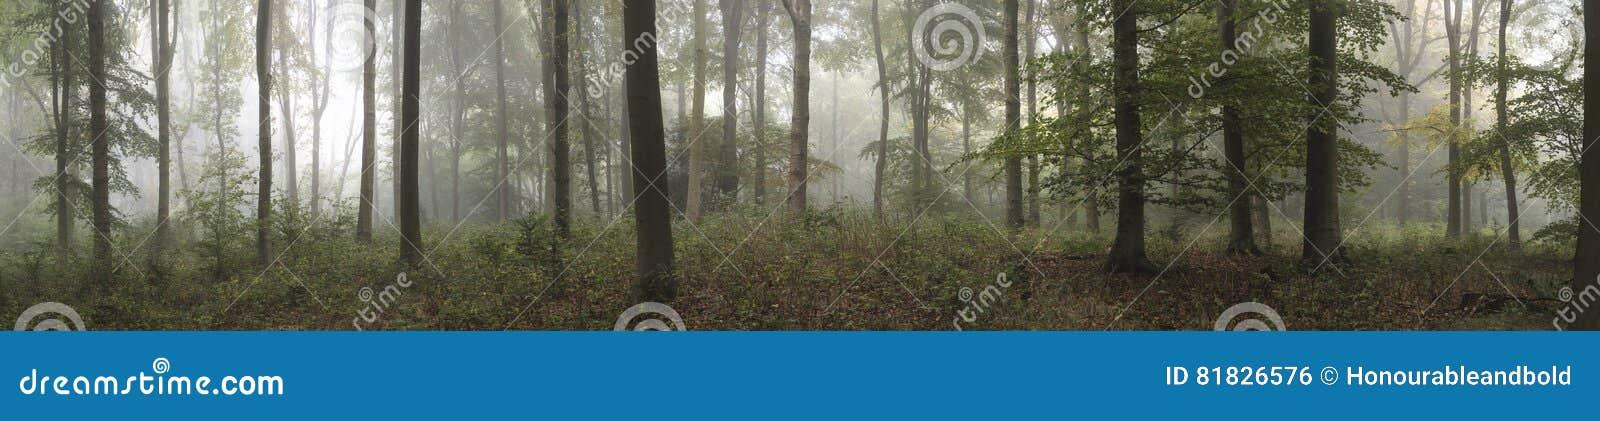 Panorama landscape image of Wendover Woods on foggy Autumn Morning.